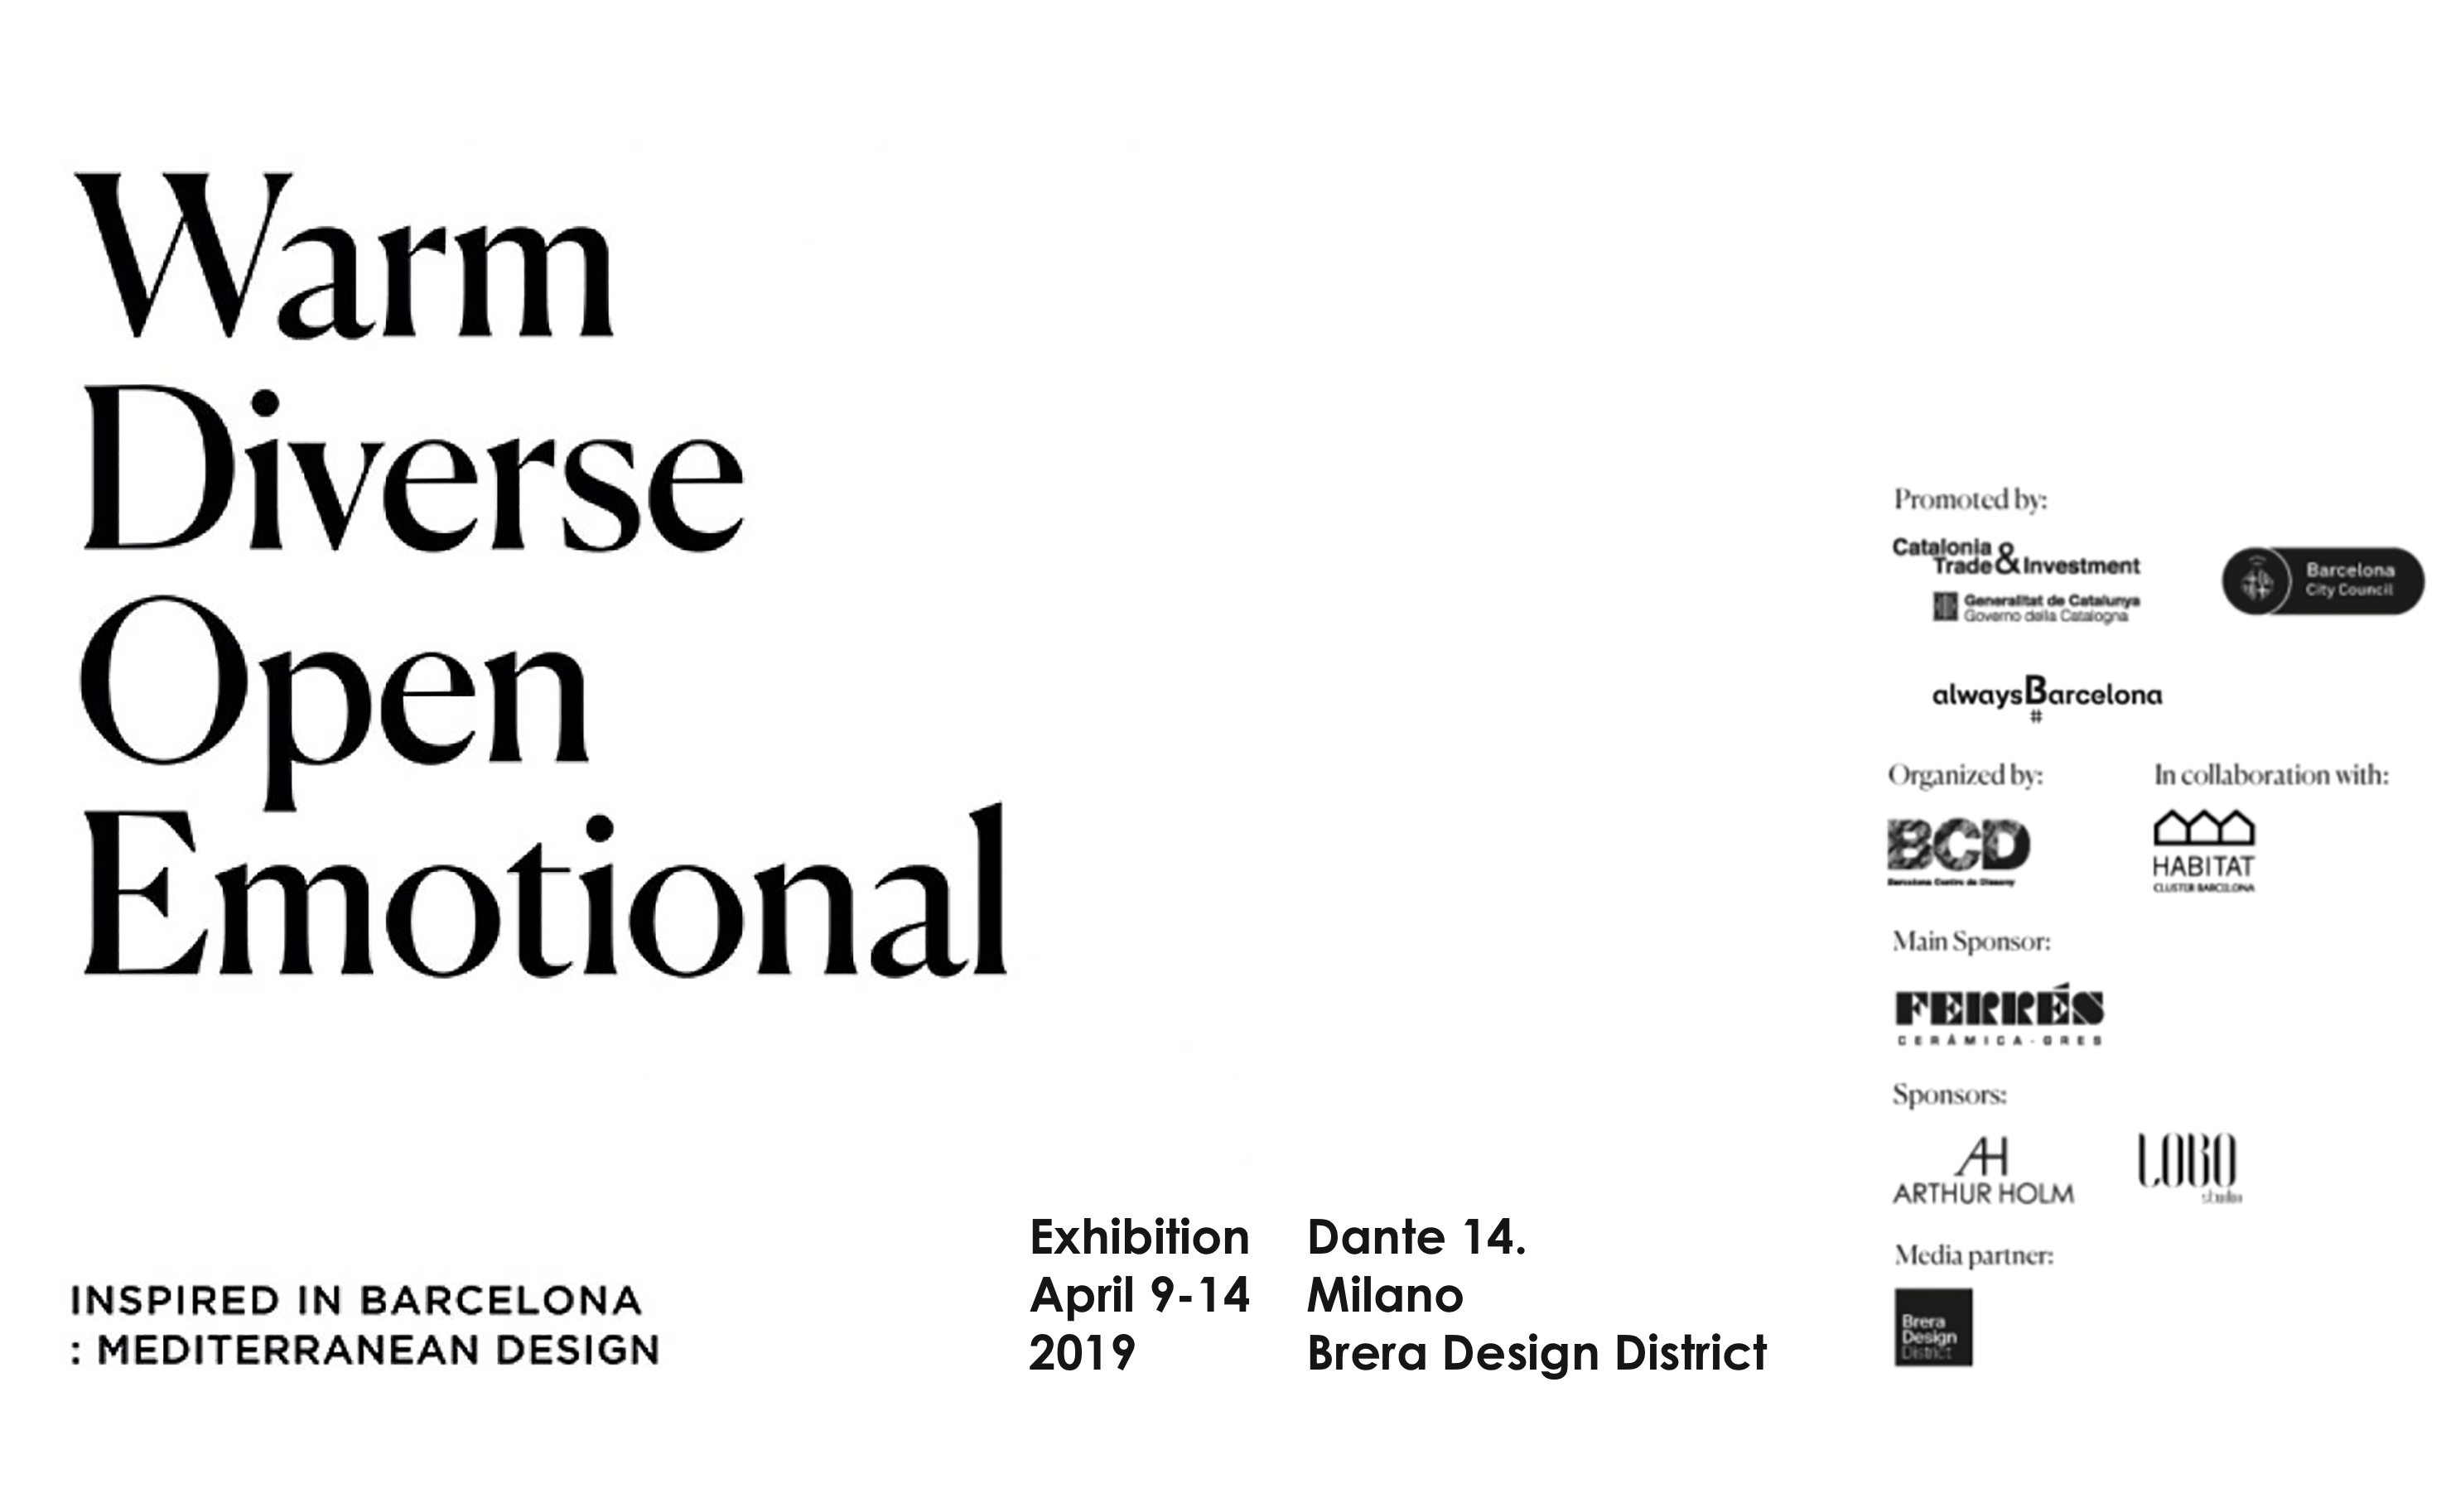 Inspired in Barcelona: Mediterranean Design